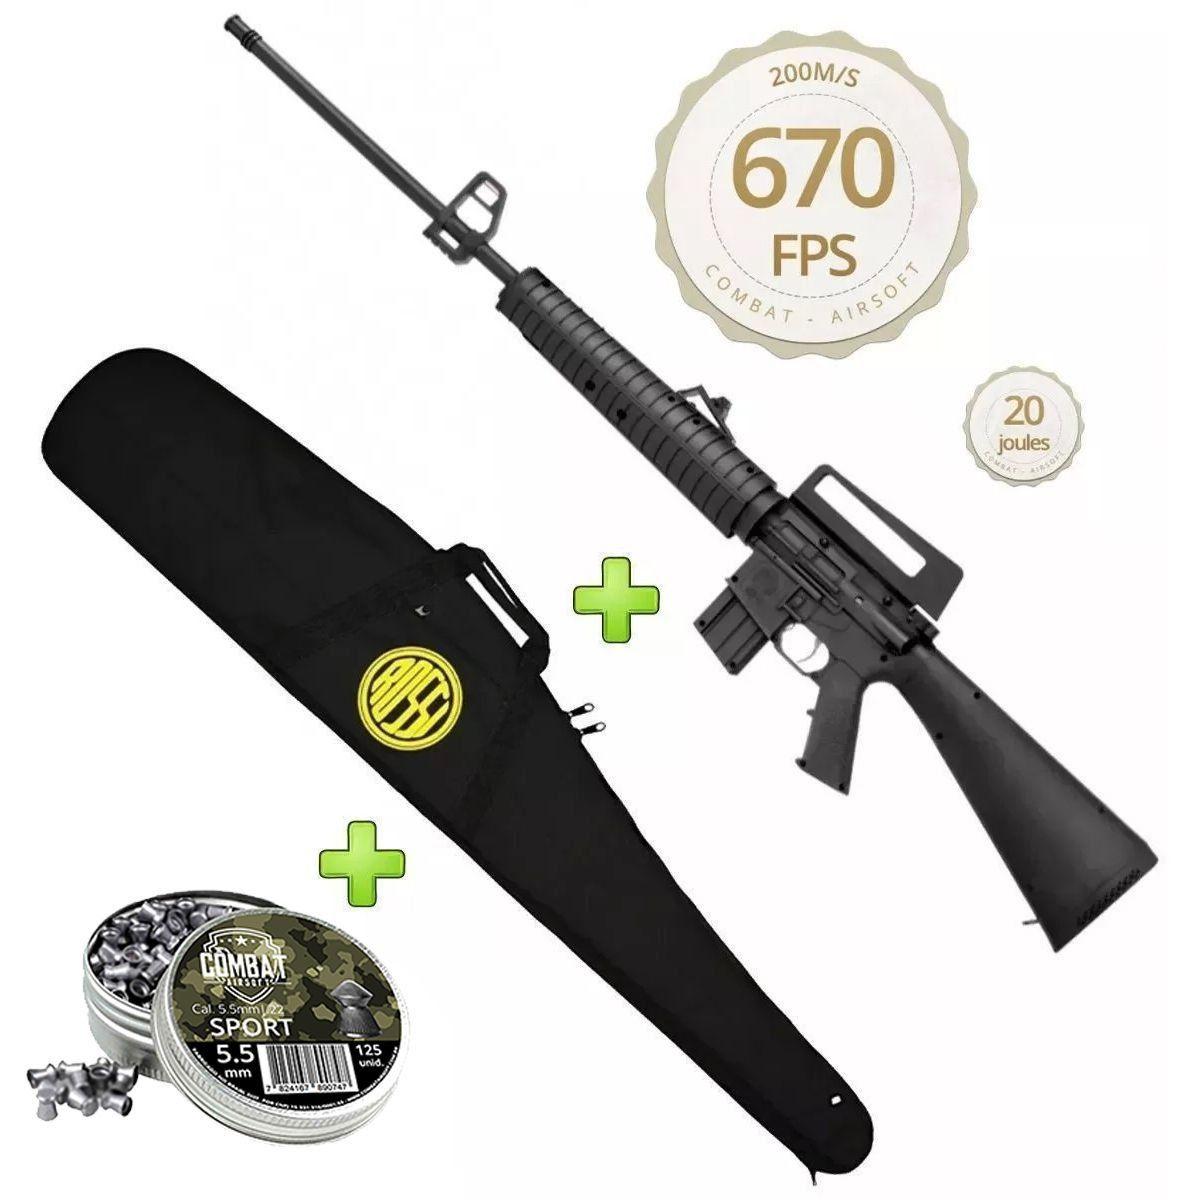 Kit Carabina De Pressão Rossi Rifle M-16 R 5,5mm + Capa + Chumbo